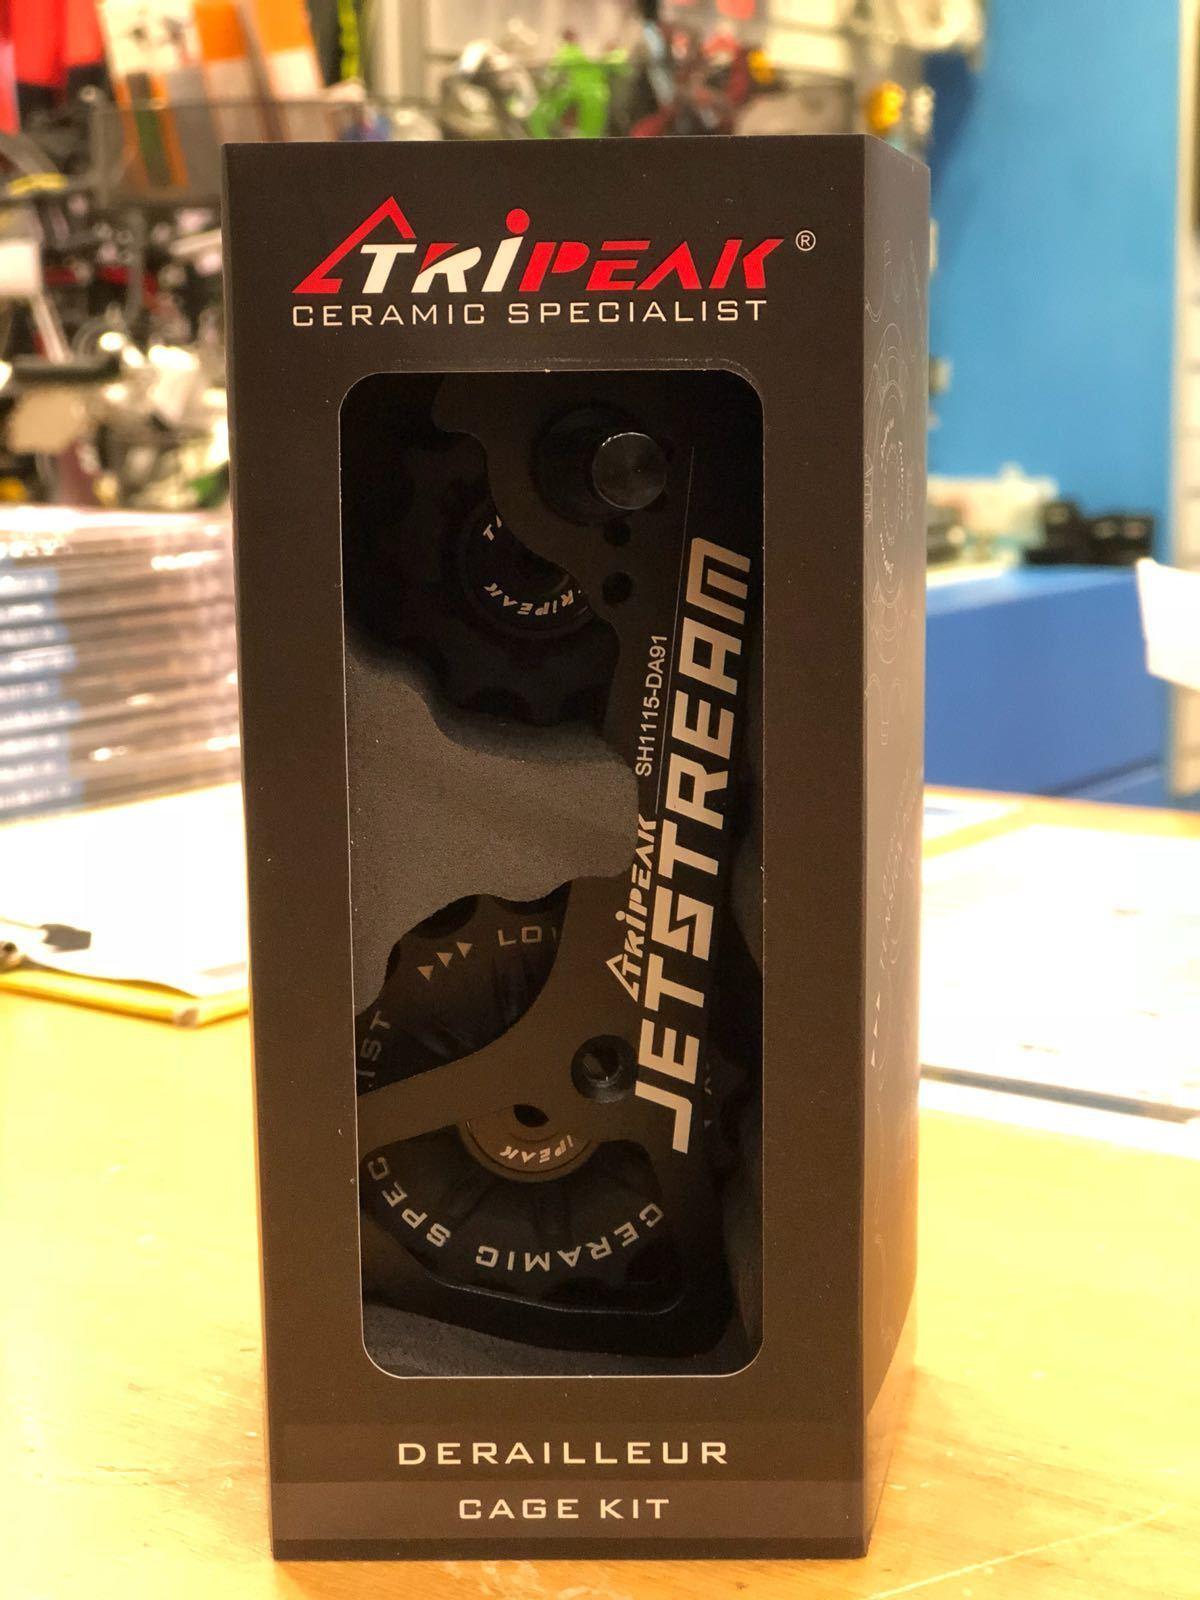 Tripeak Oversize Derailleur Cage Kit 11-15 Tooth Super ceramic For Shimano 91 80